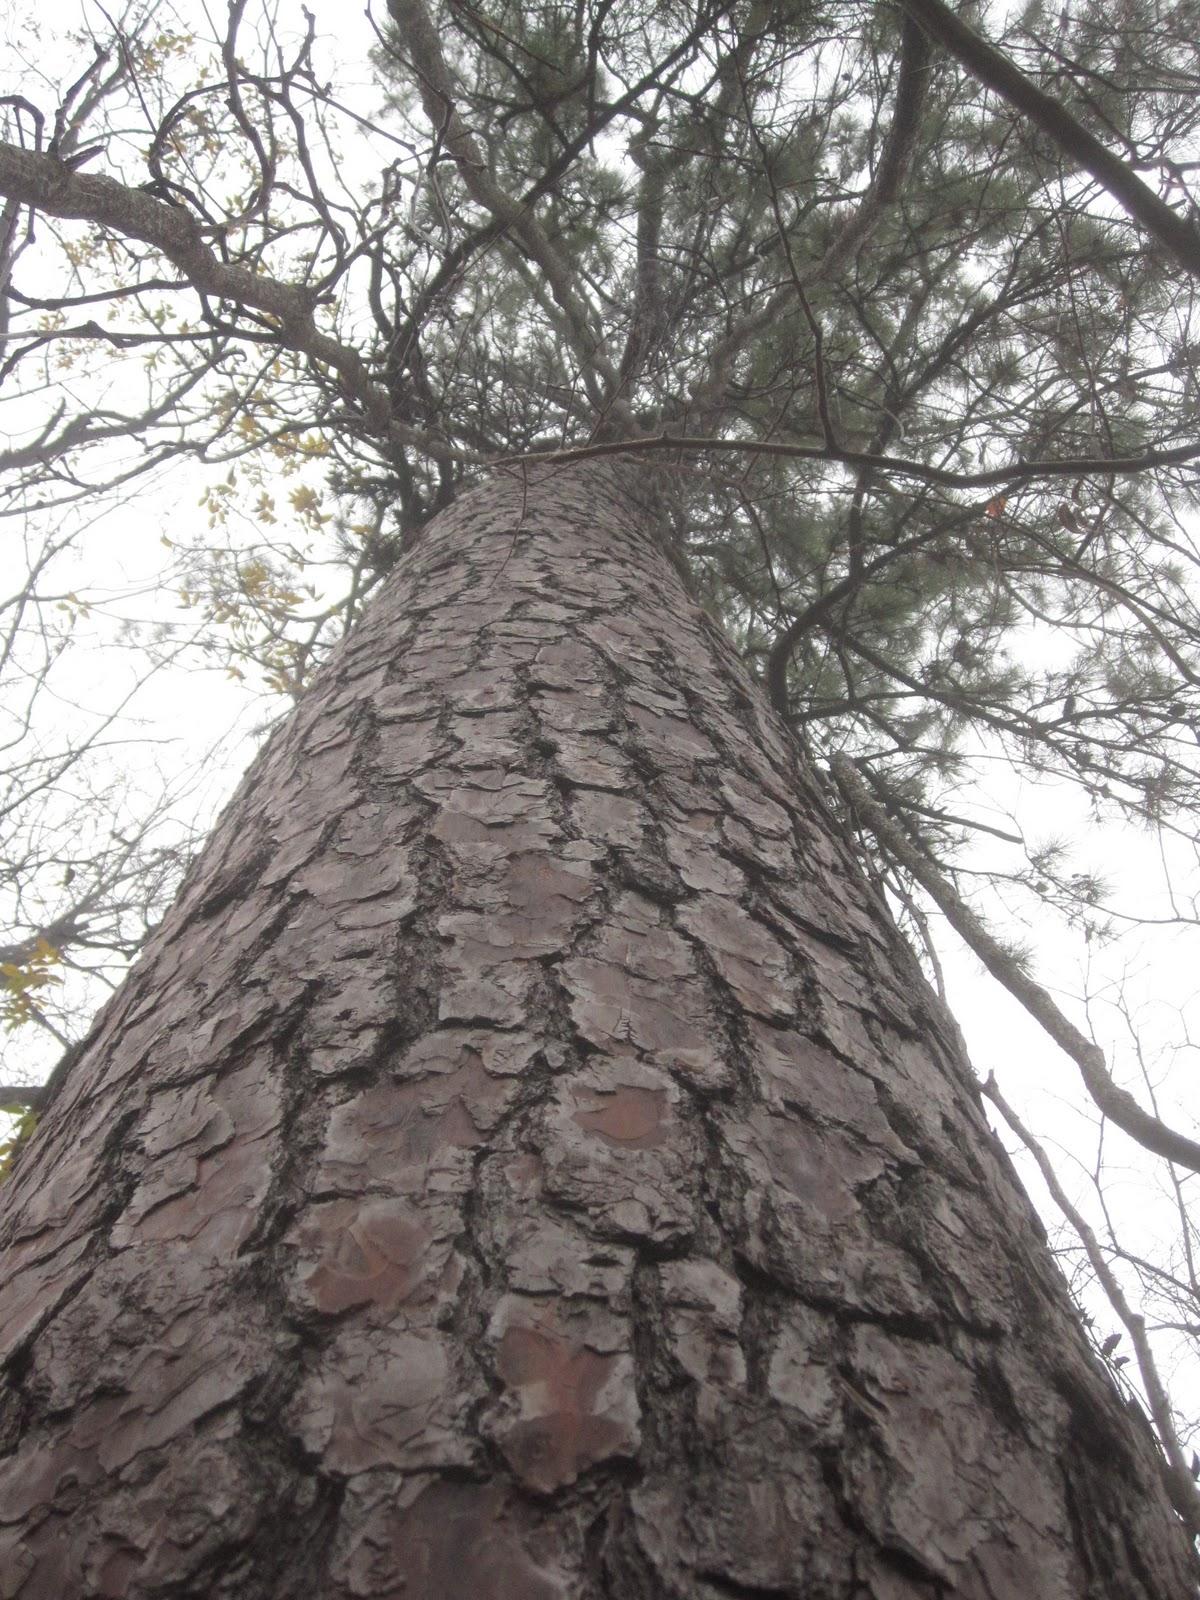 Tropical Texana: A TRIBUTE TO 500 MILLION TEXAS TREES